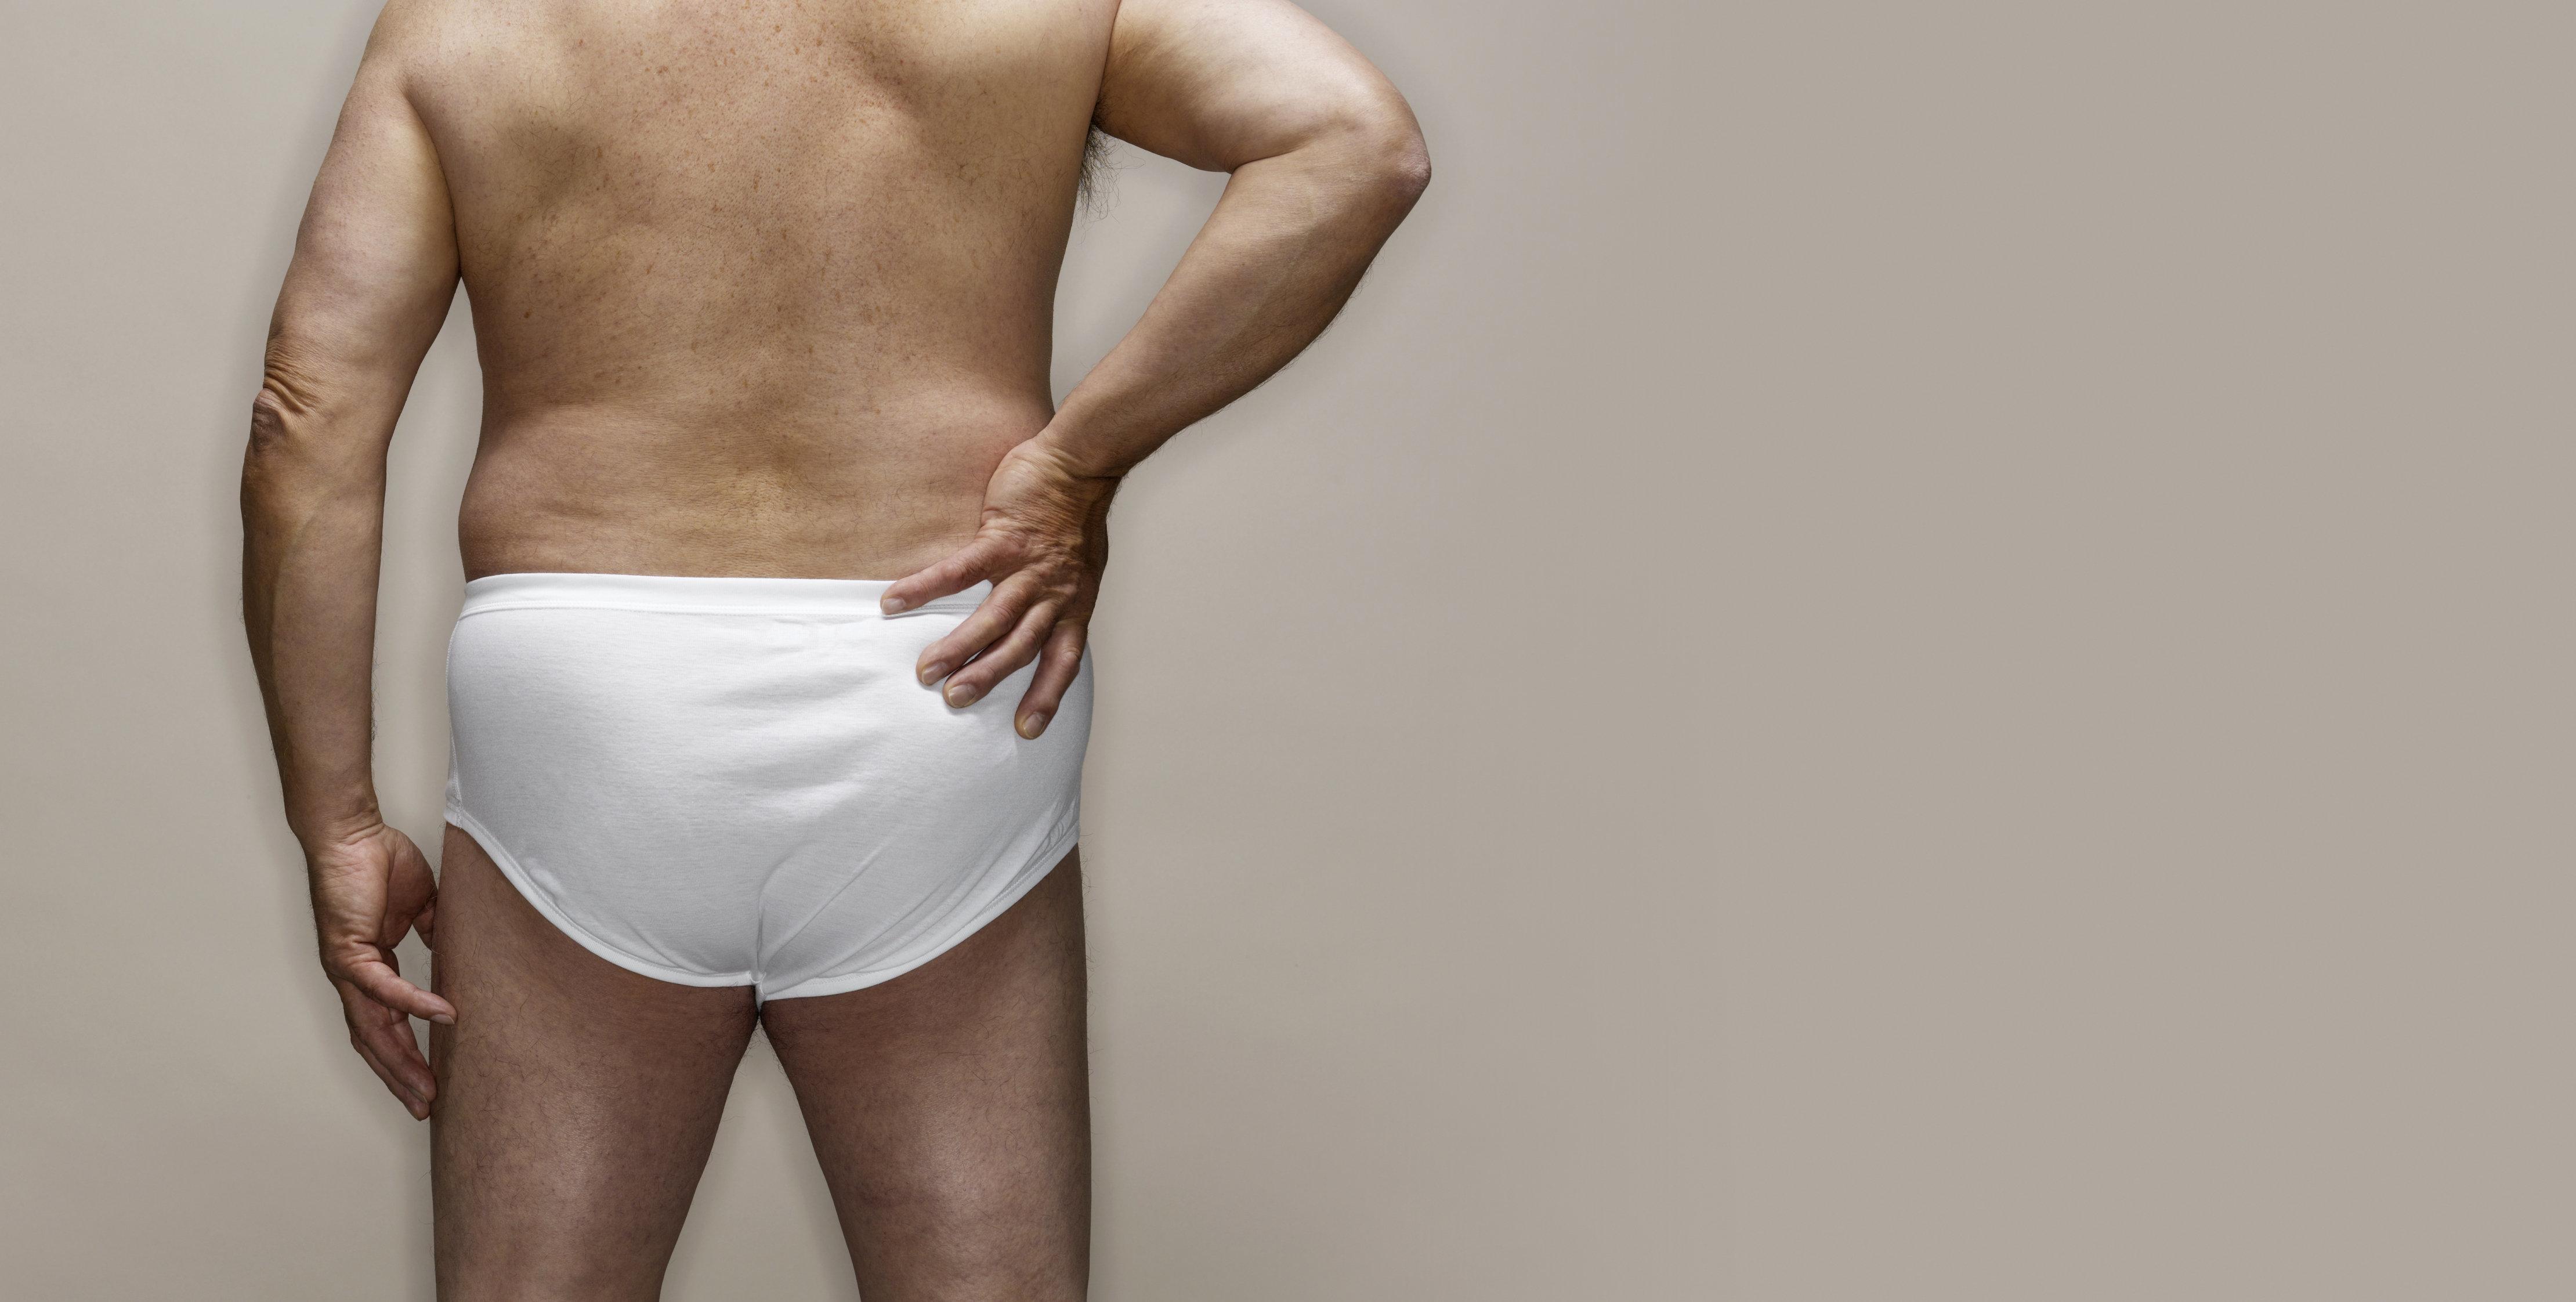 Pics of men wearing panties